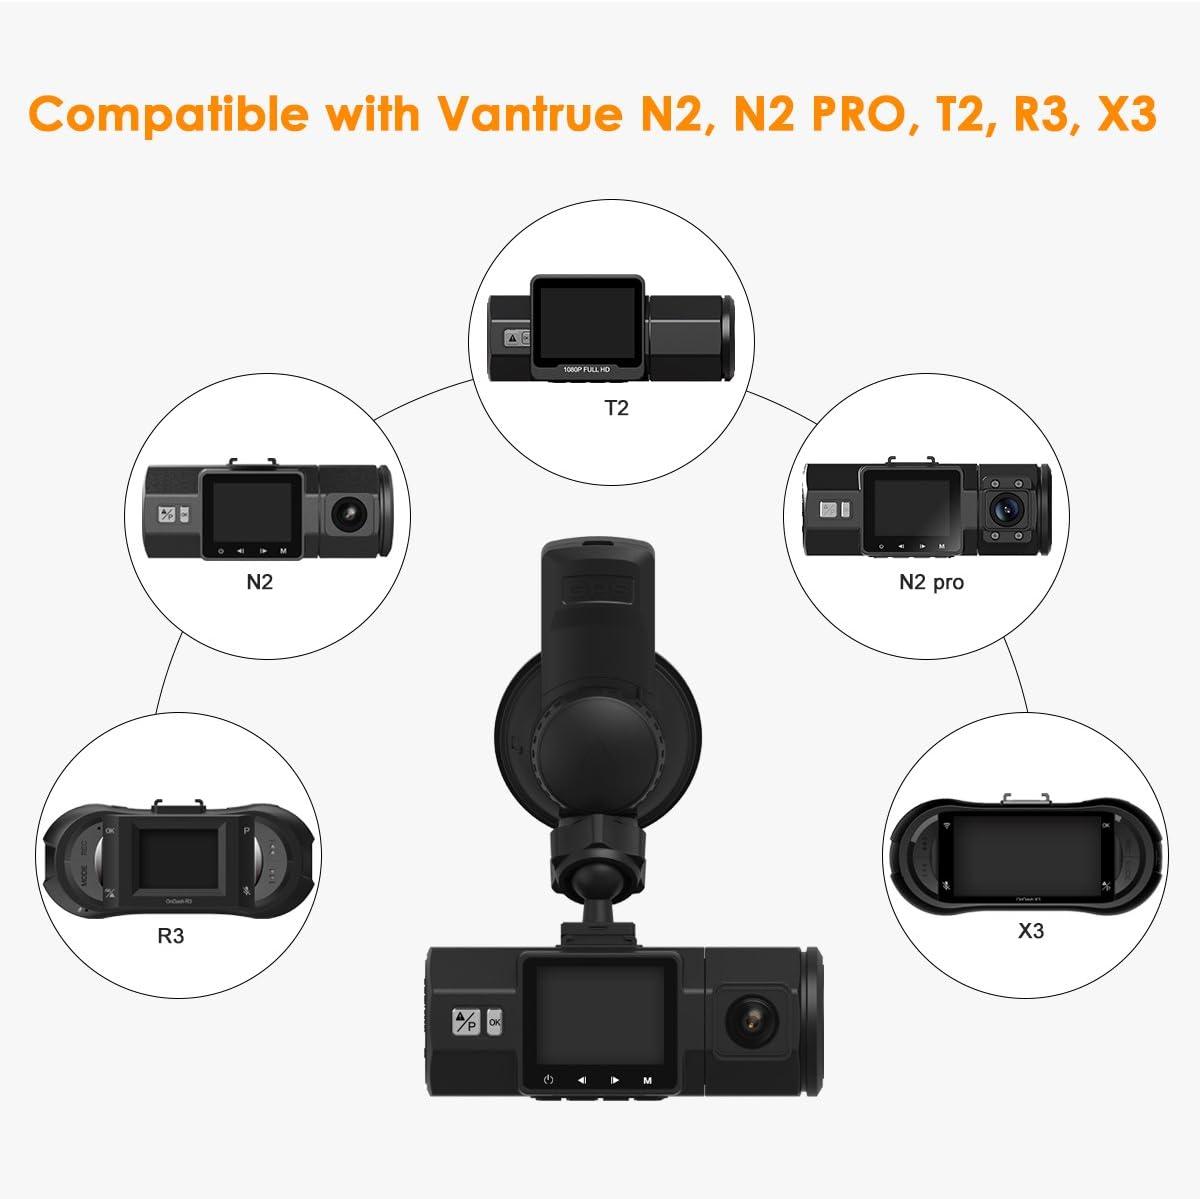 Upgrade New Version Vantrue N2 Pro//N2//T2//R3//X3 Dash Cam Mini USB Port Car Windshield Suction Cup Mount